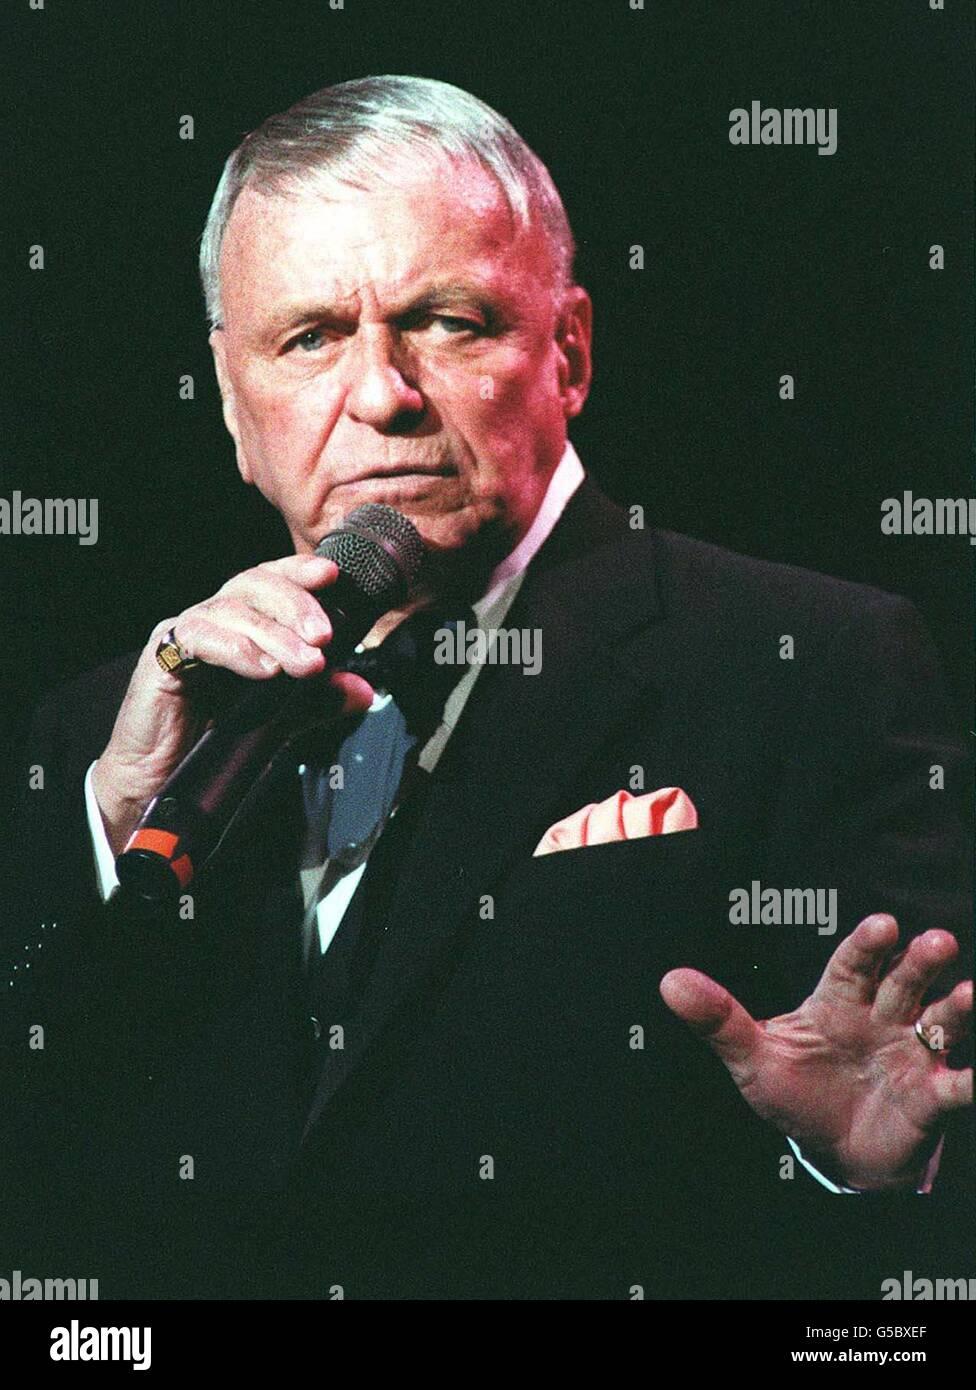 Frank Sinatra Royal Albert Hall 92 Stock Photo